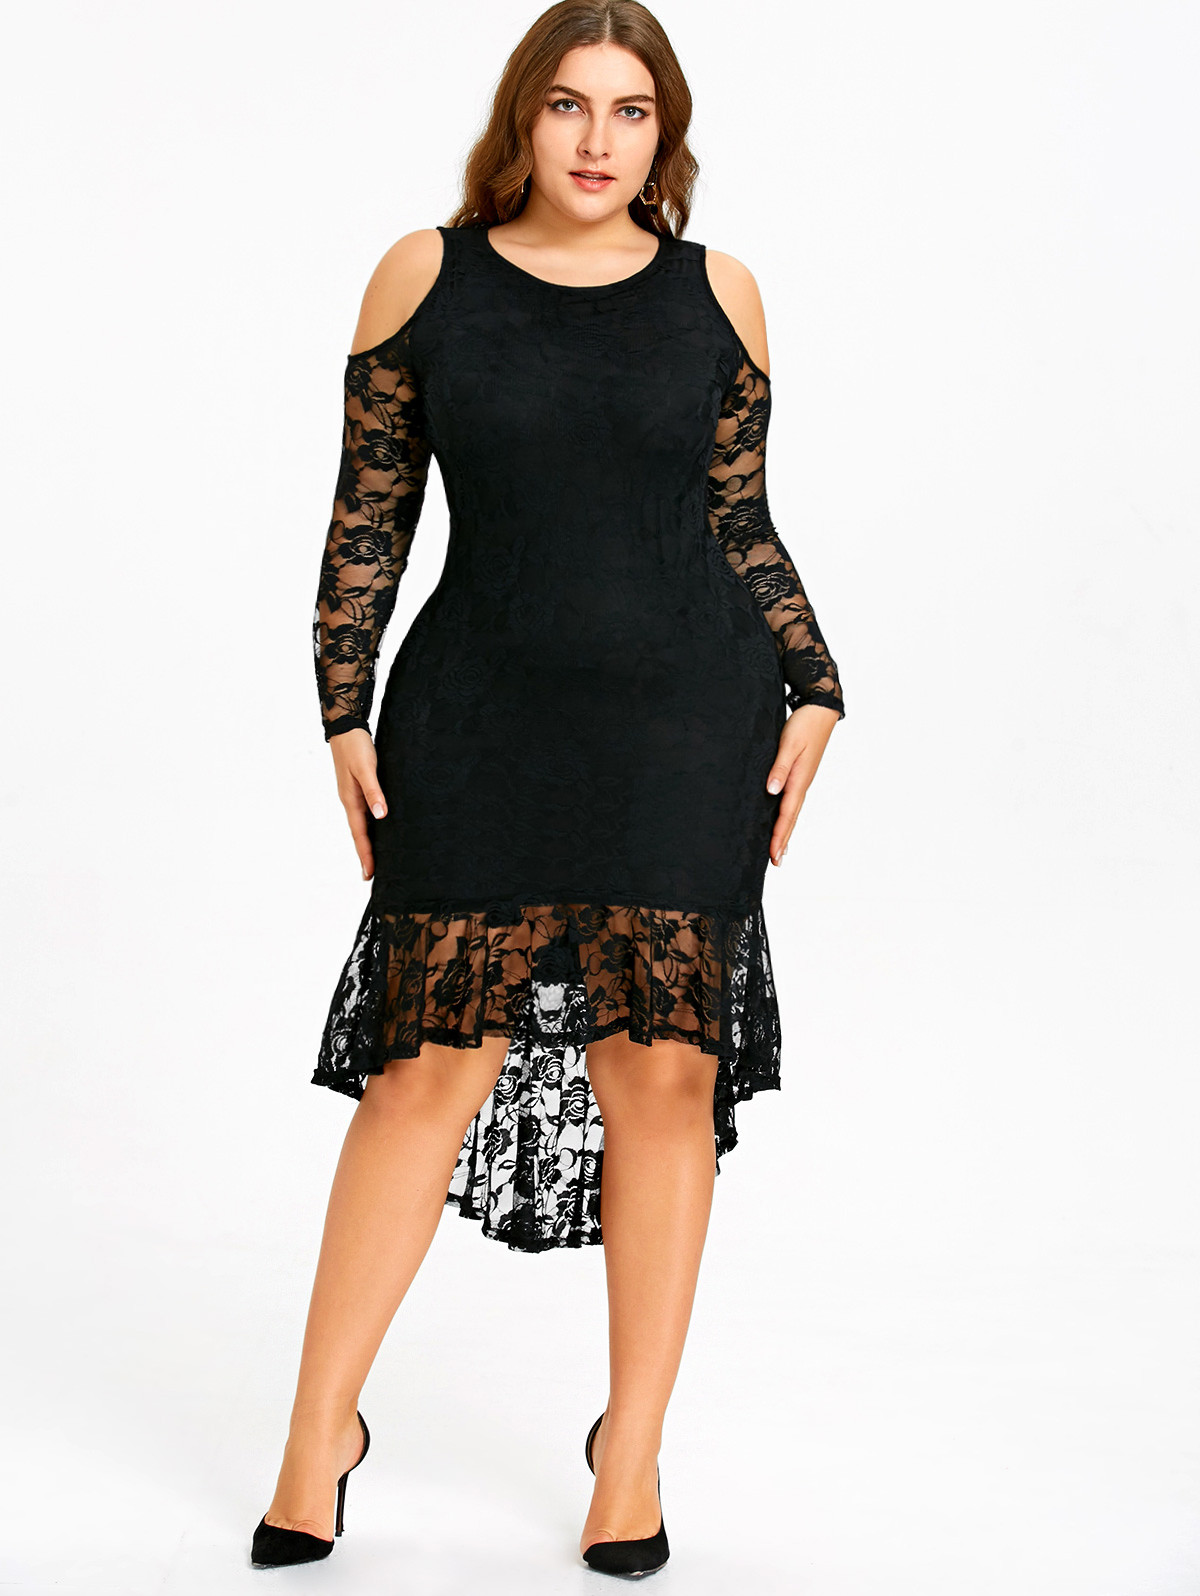 Wipalo Women 2018 New Fashions Plus Size 5XL Cold Shoulder Lace High Low Hem Dress Vestidos